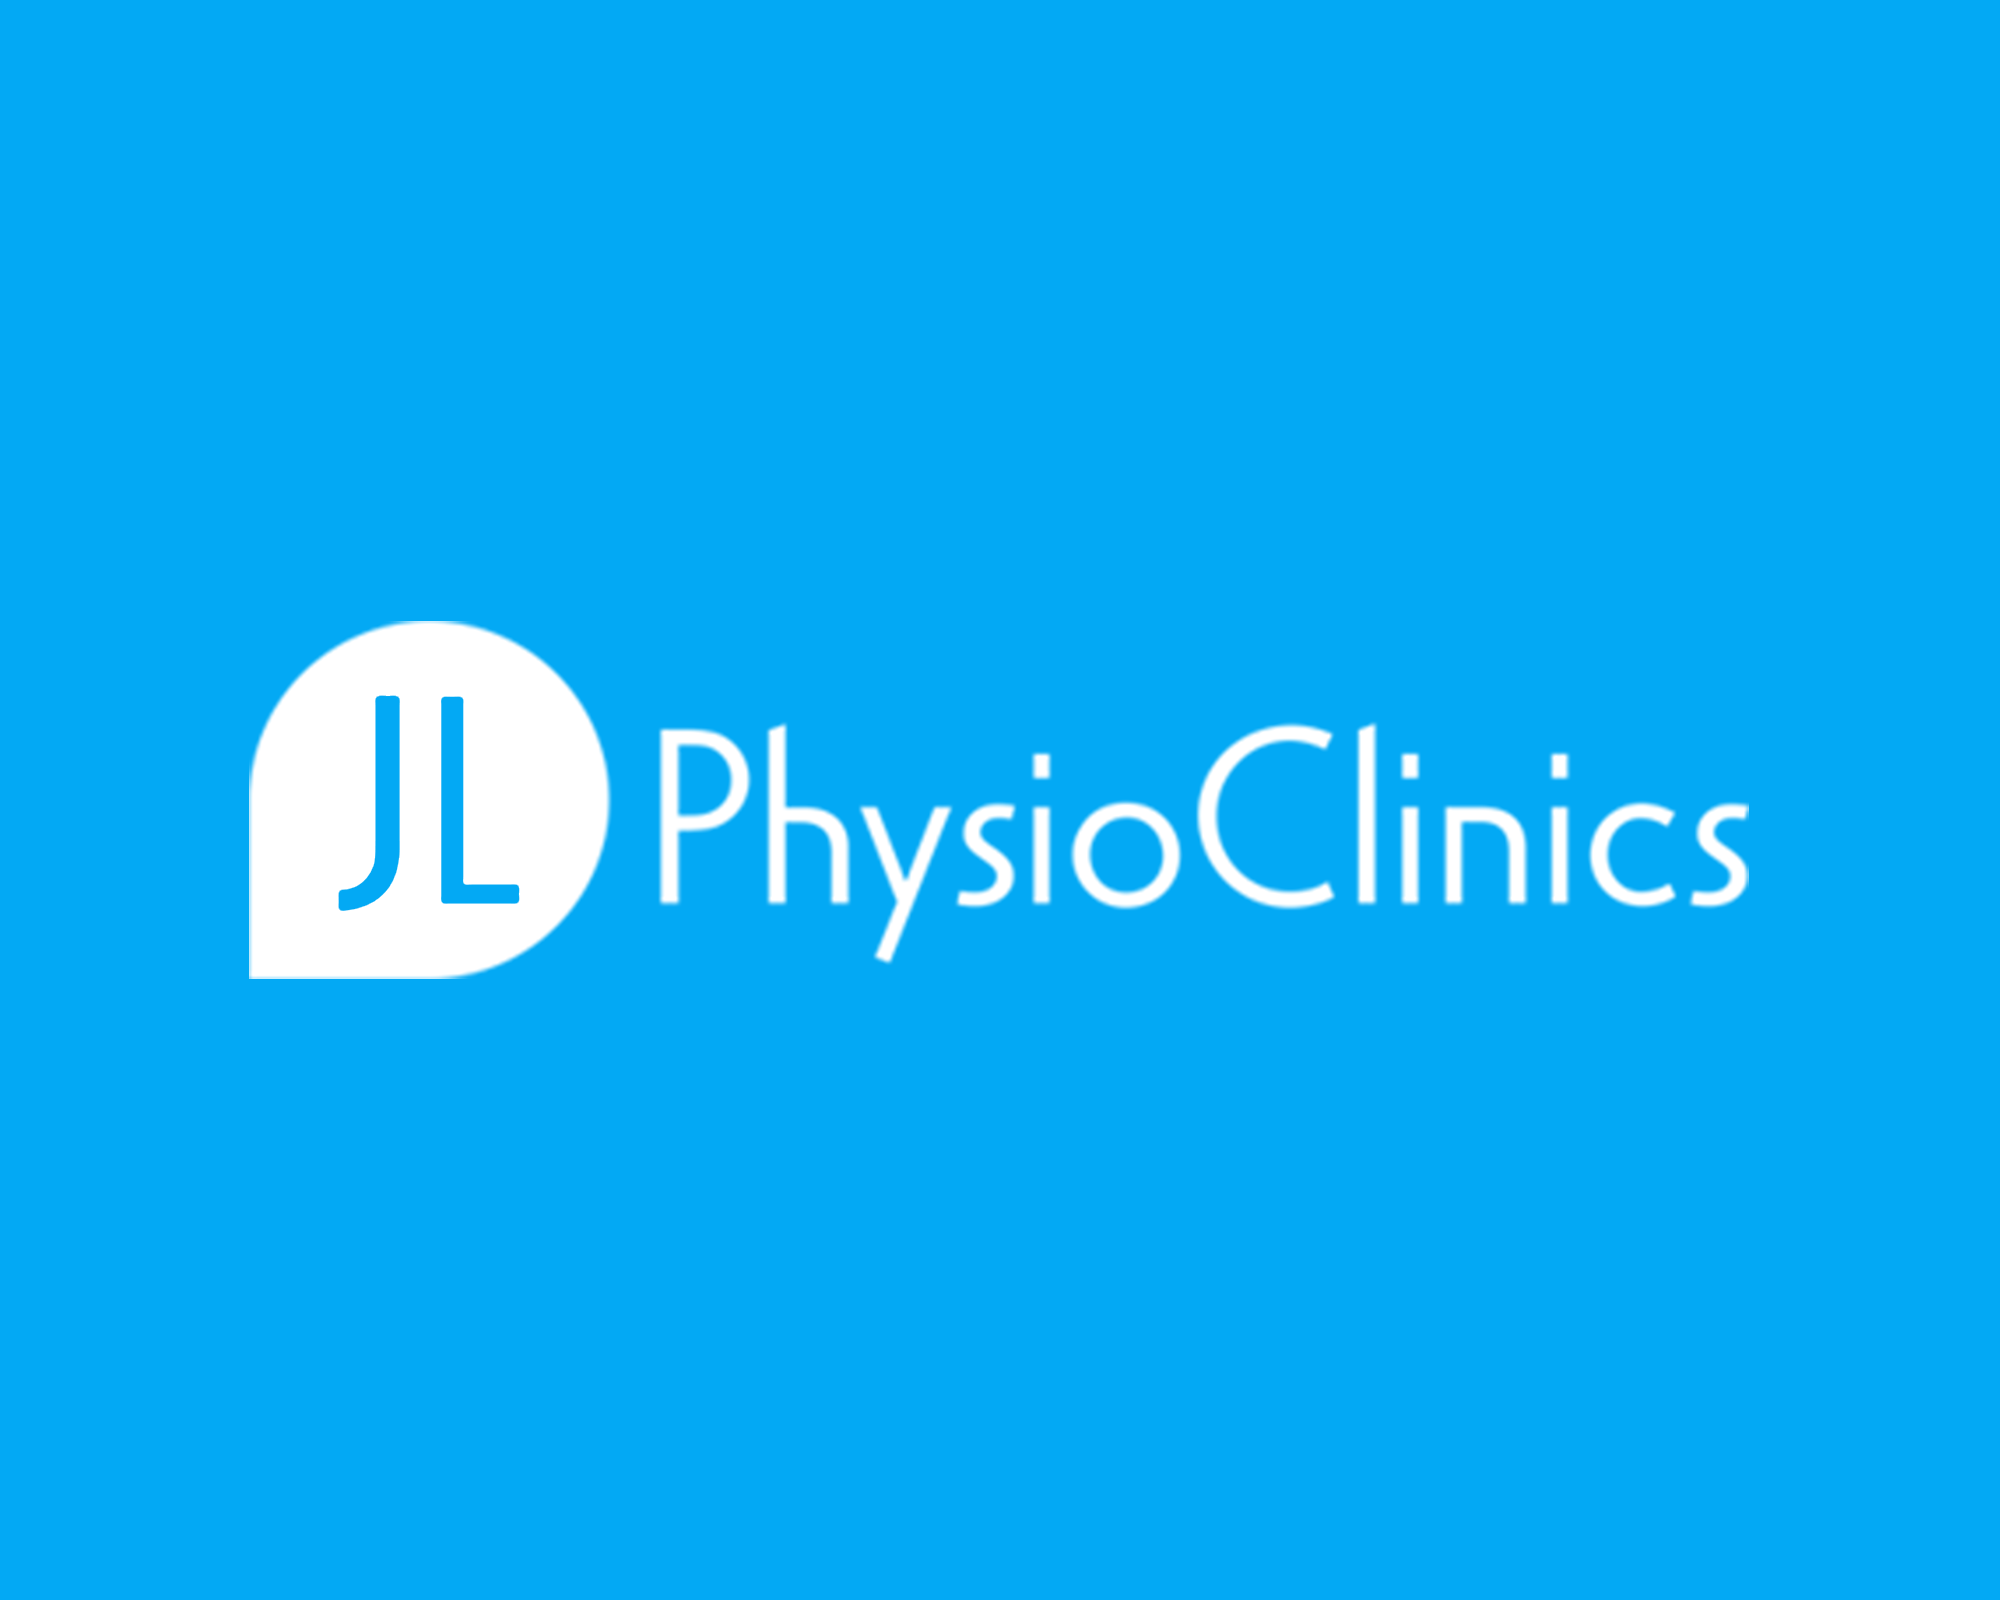 jl physio clinics Logo